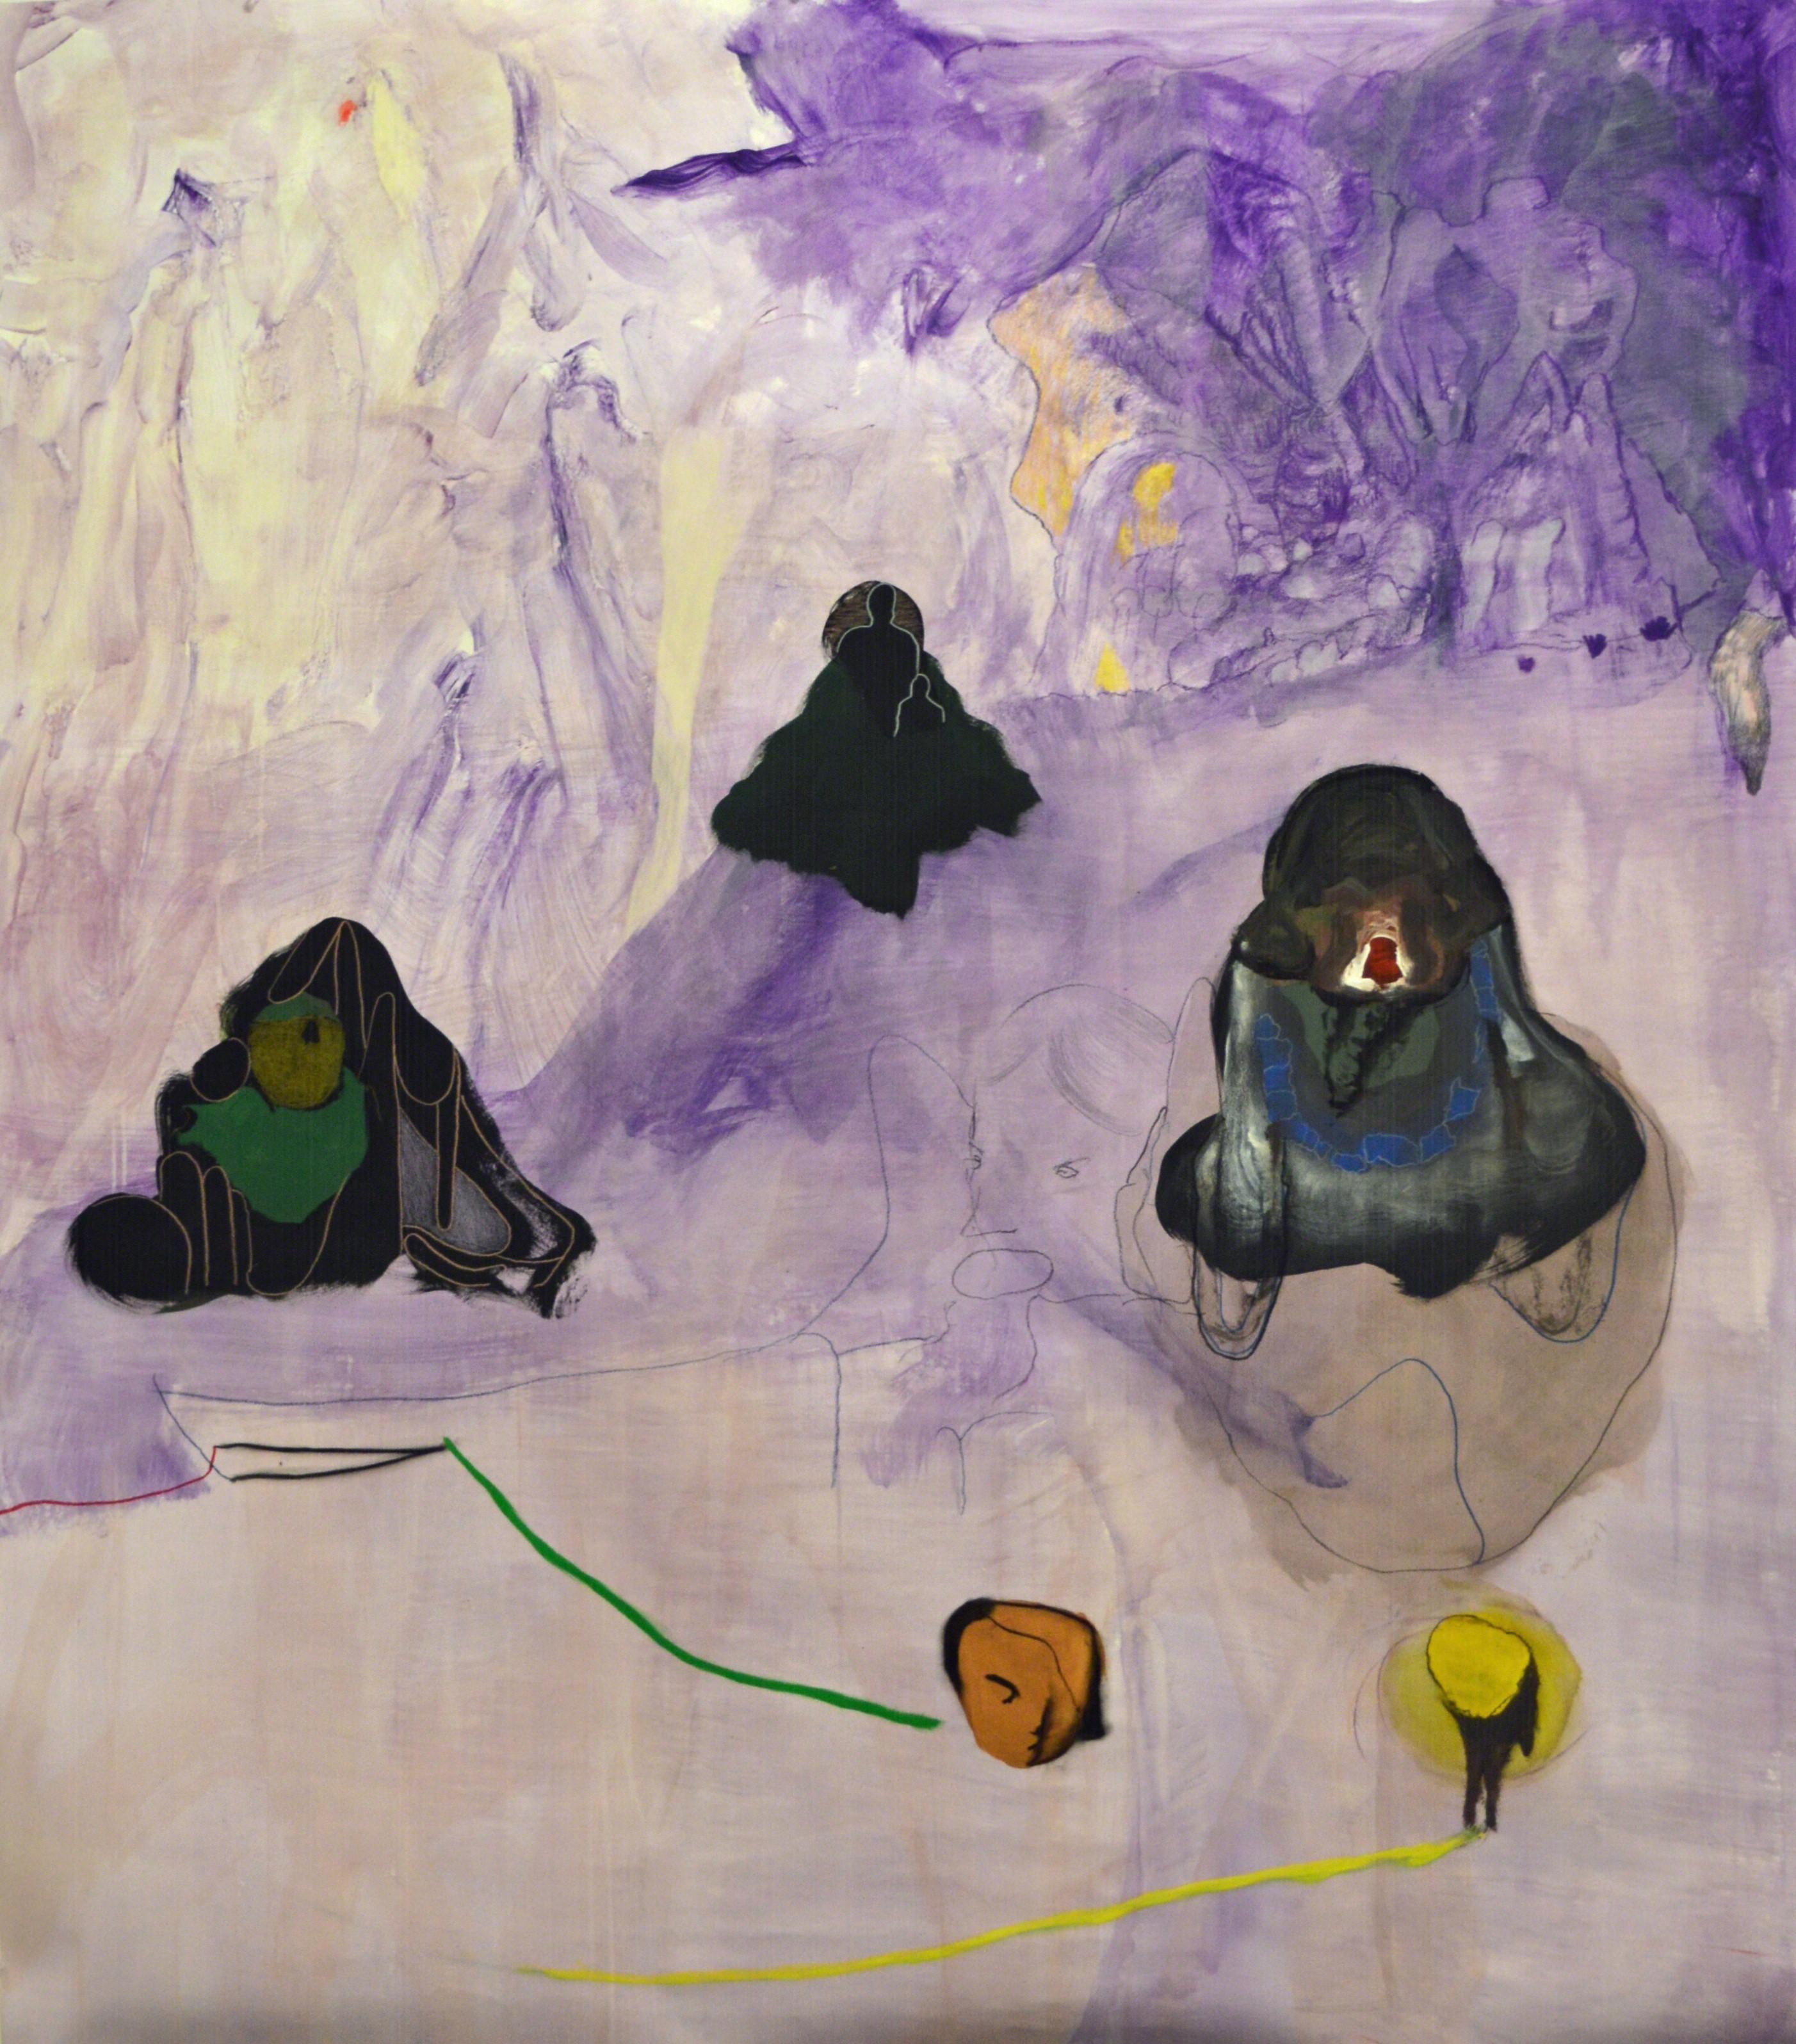 , 'Untitled,' 2014, Galerie Nathalie Obadia